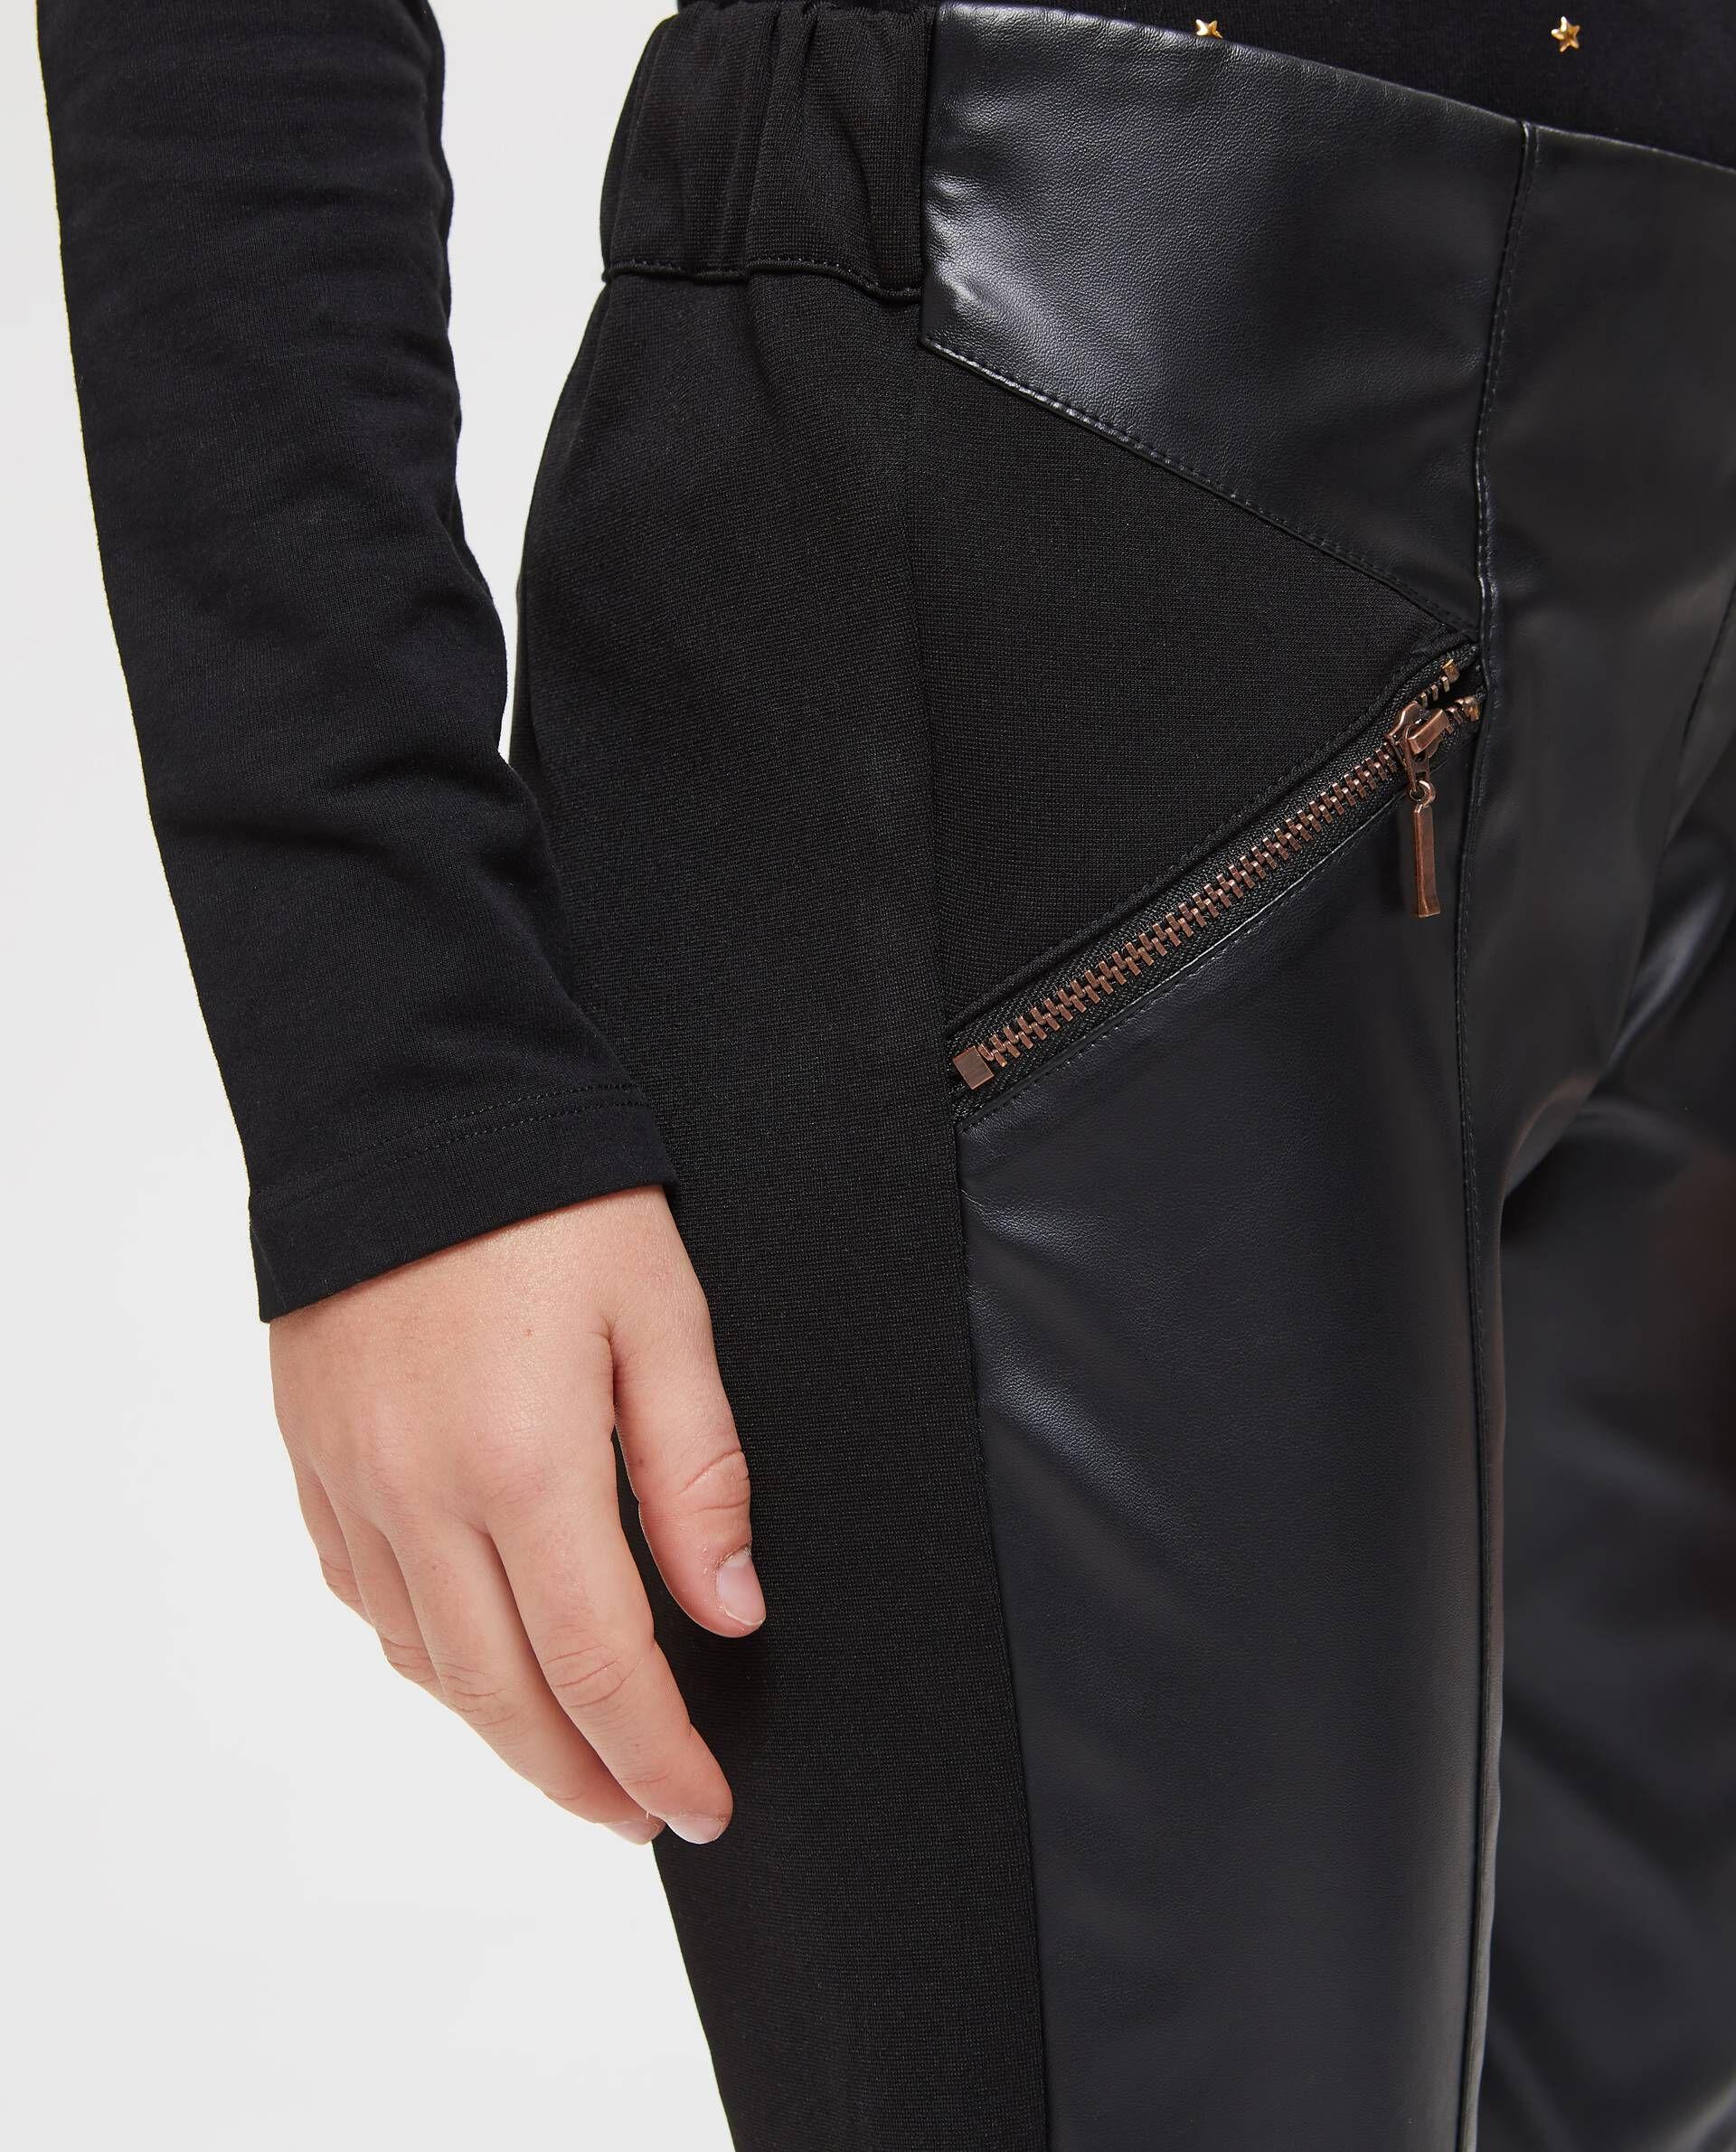 Pantaloni in similpelle con tasche